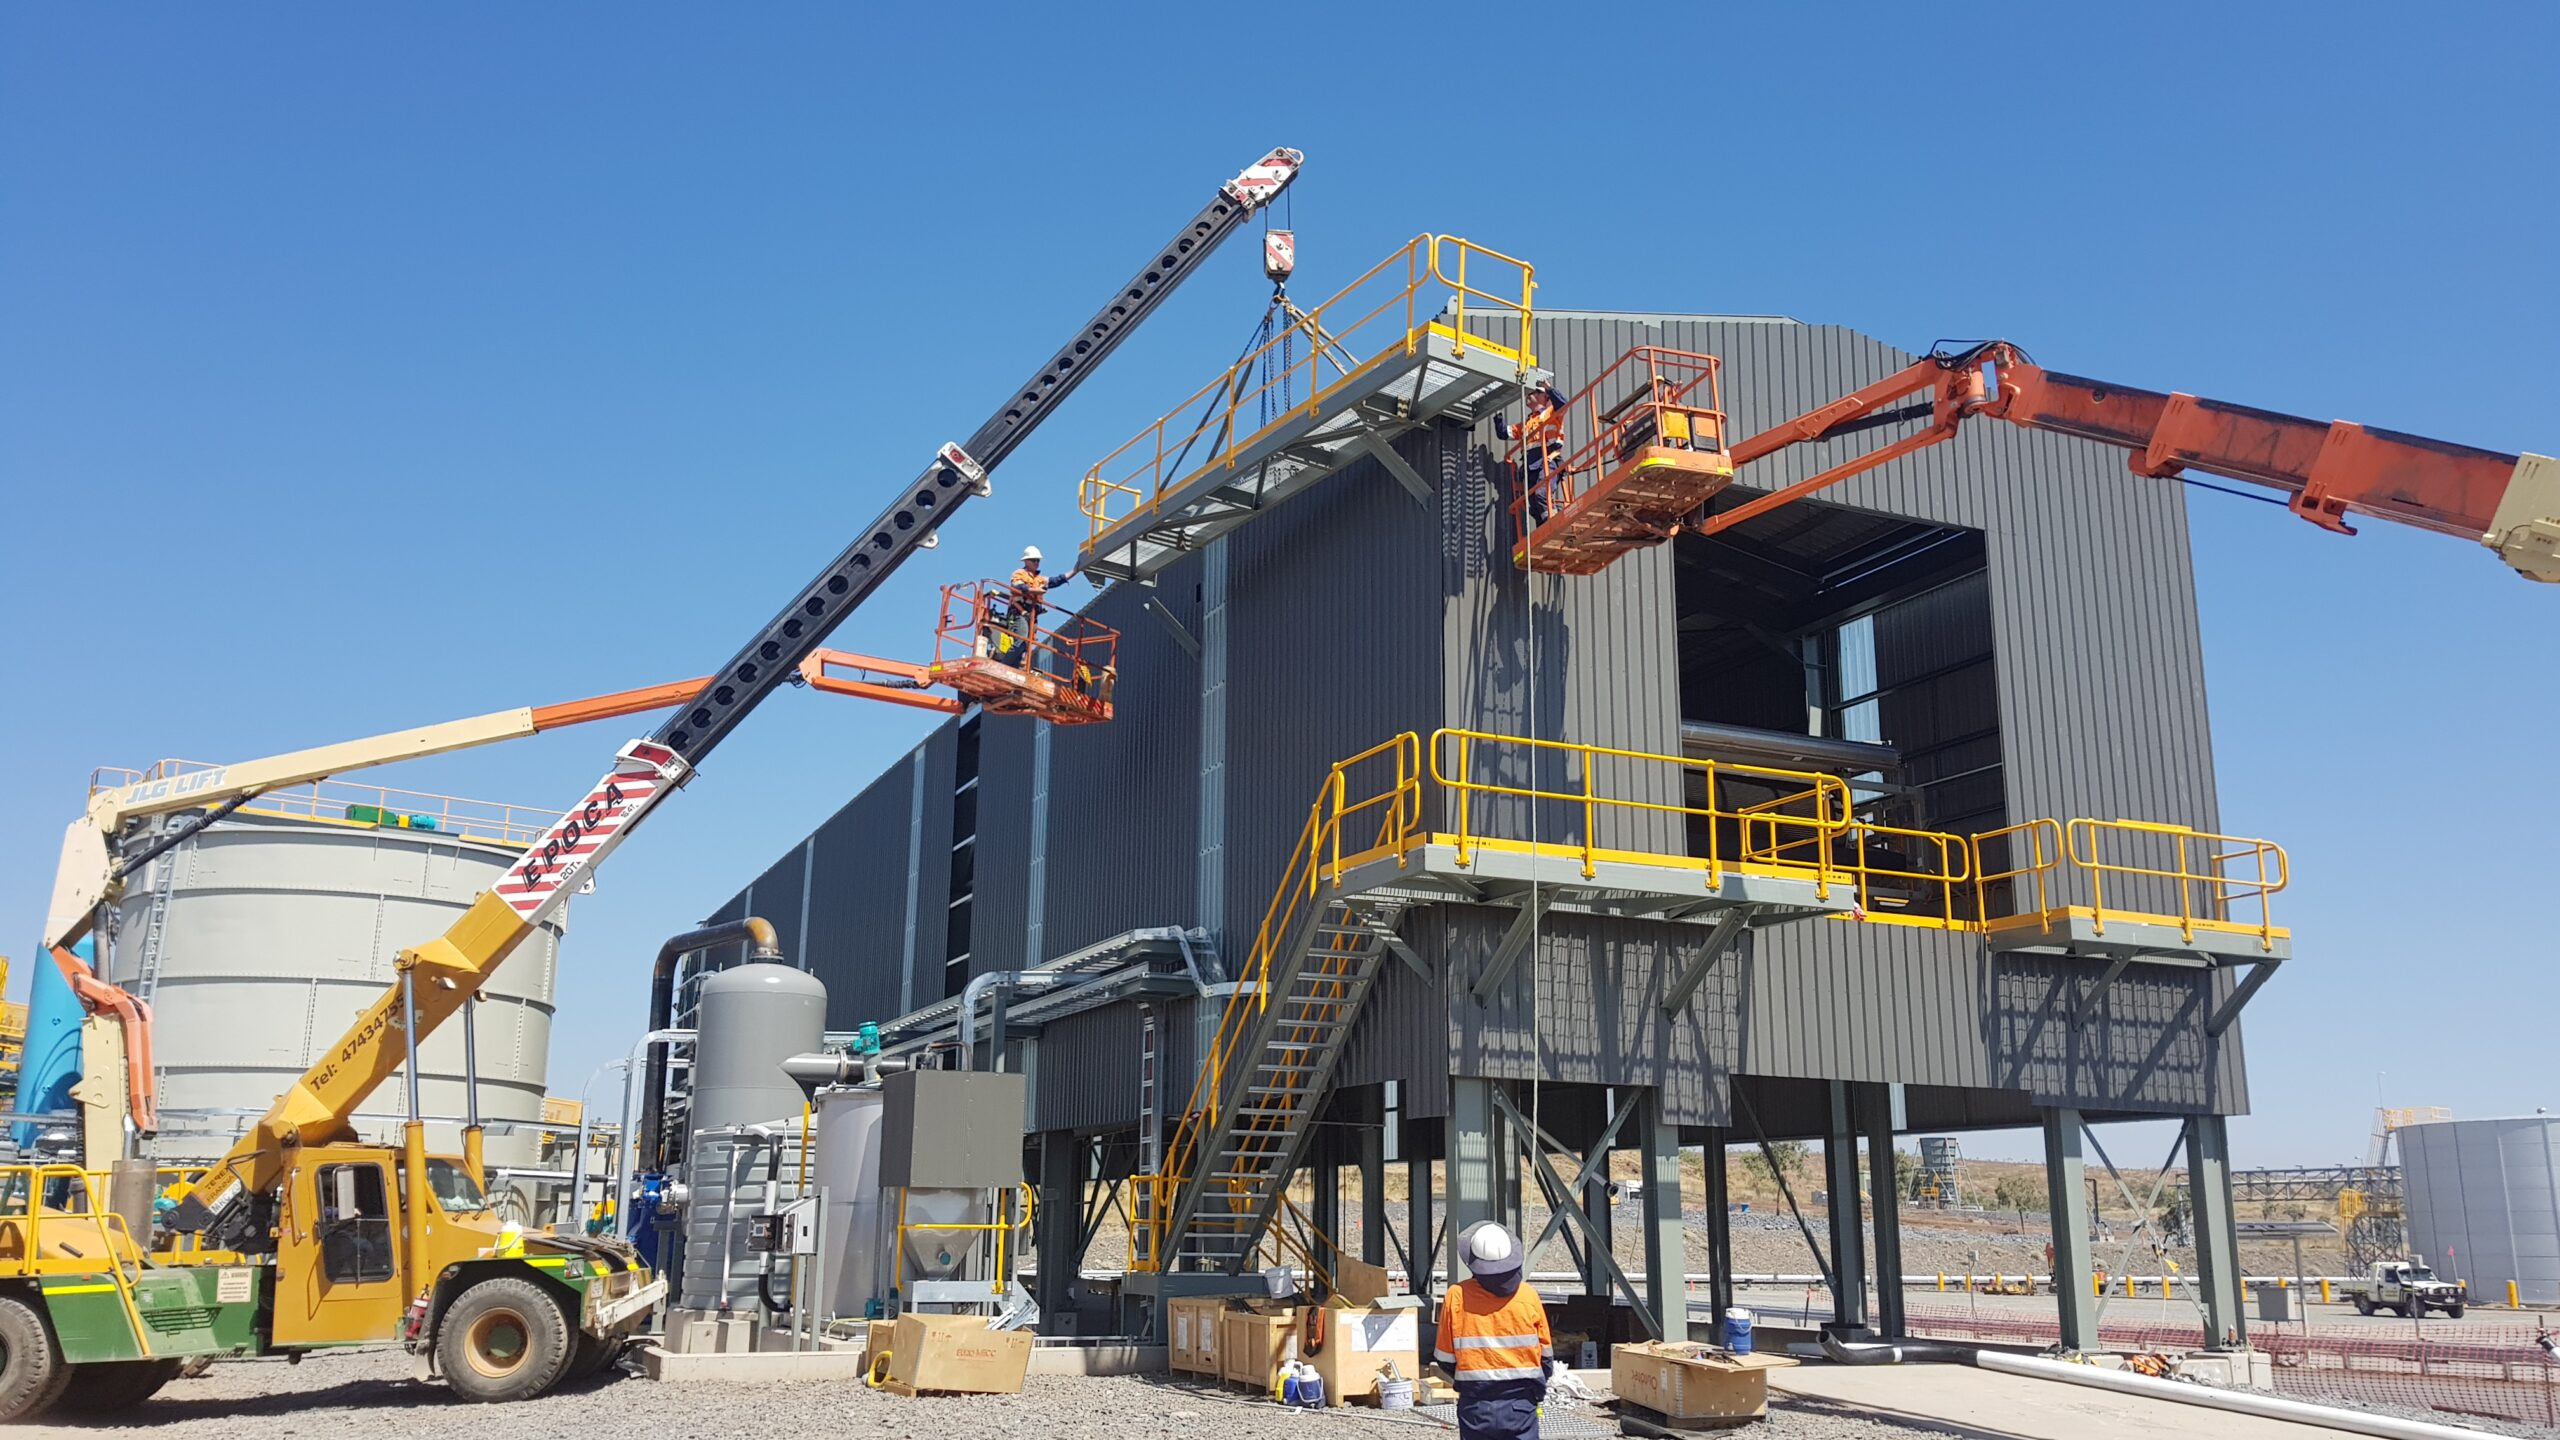 Dugald River SMP Installation 056 - Installing Top Platforms to Filter Building